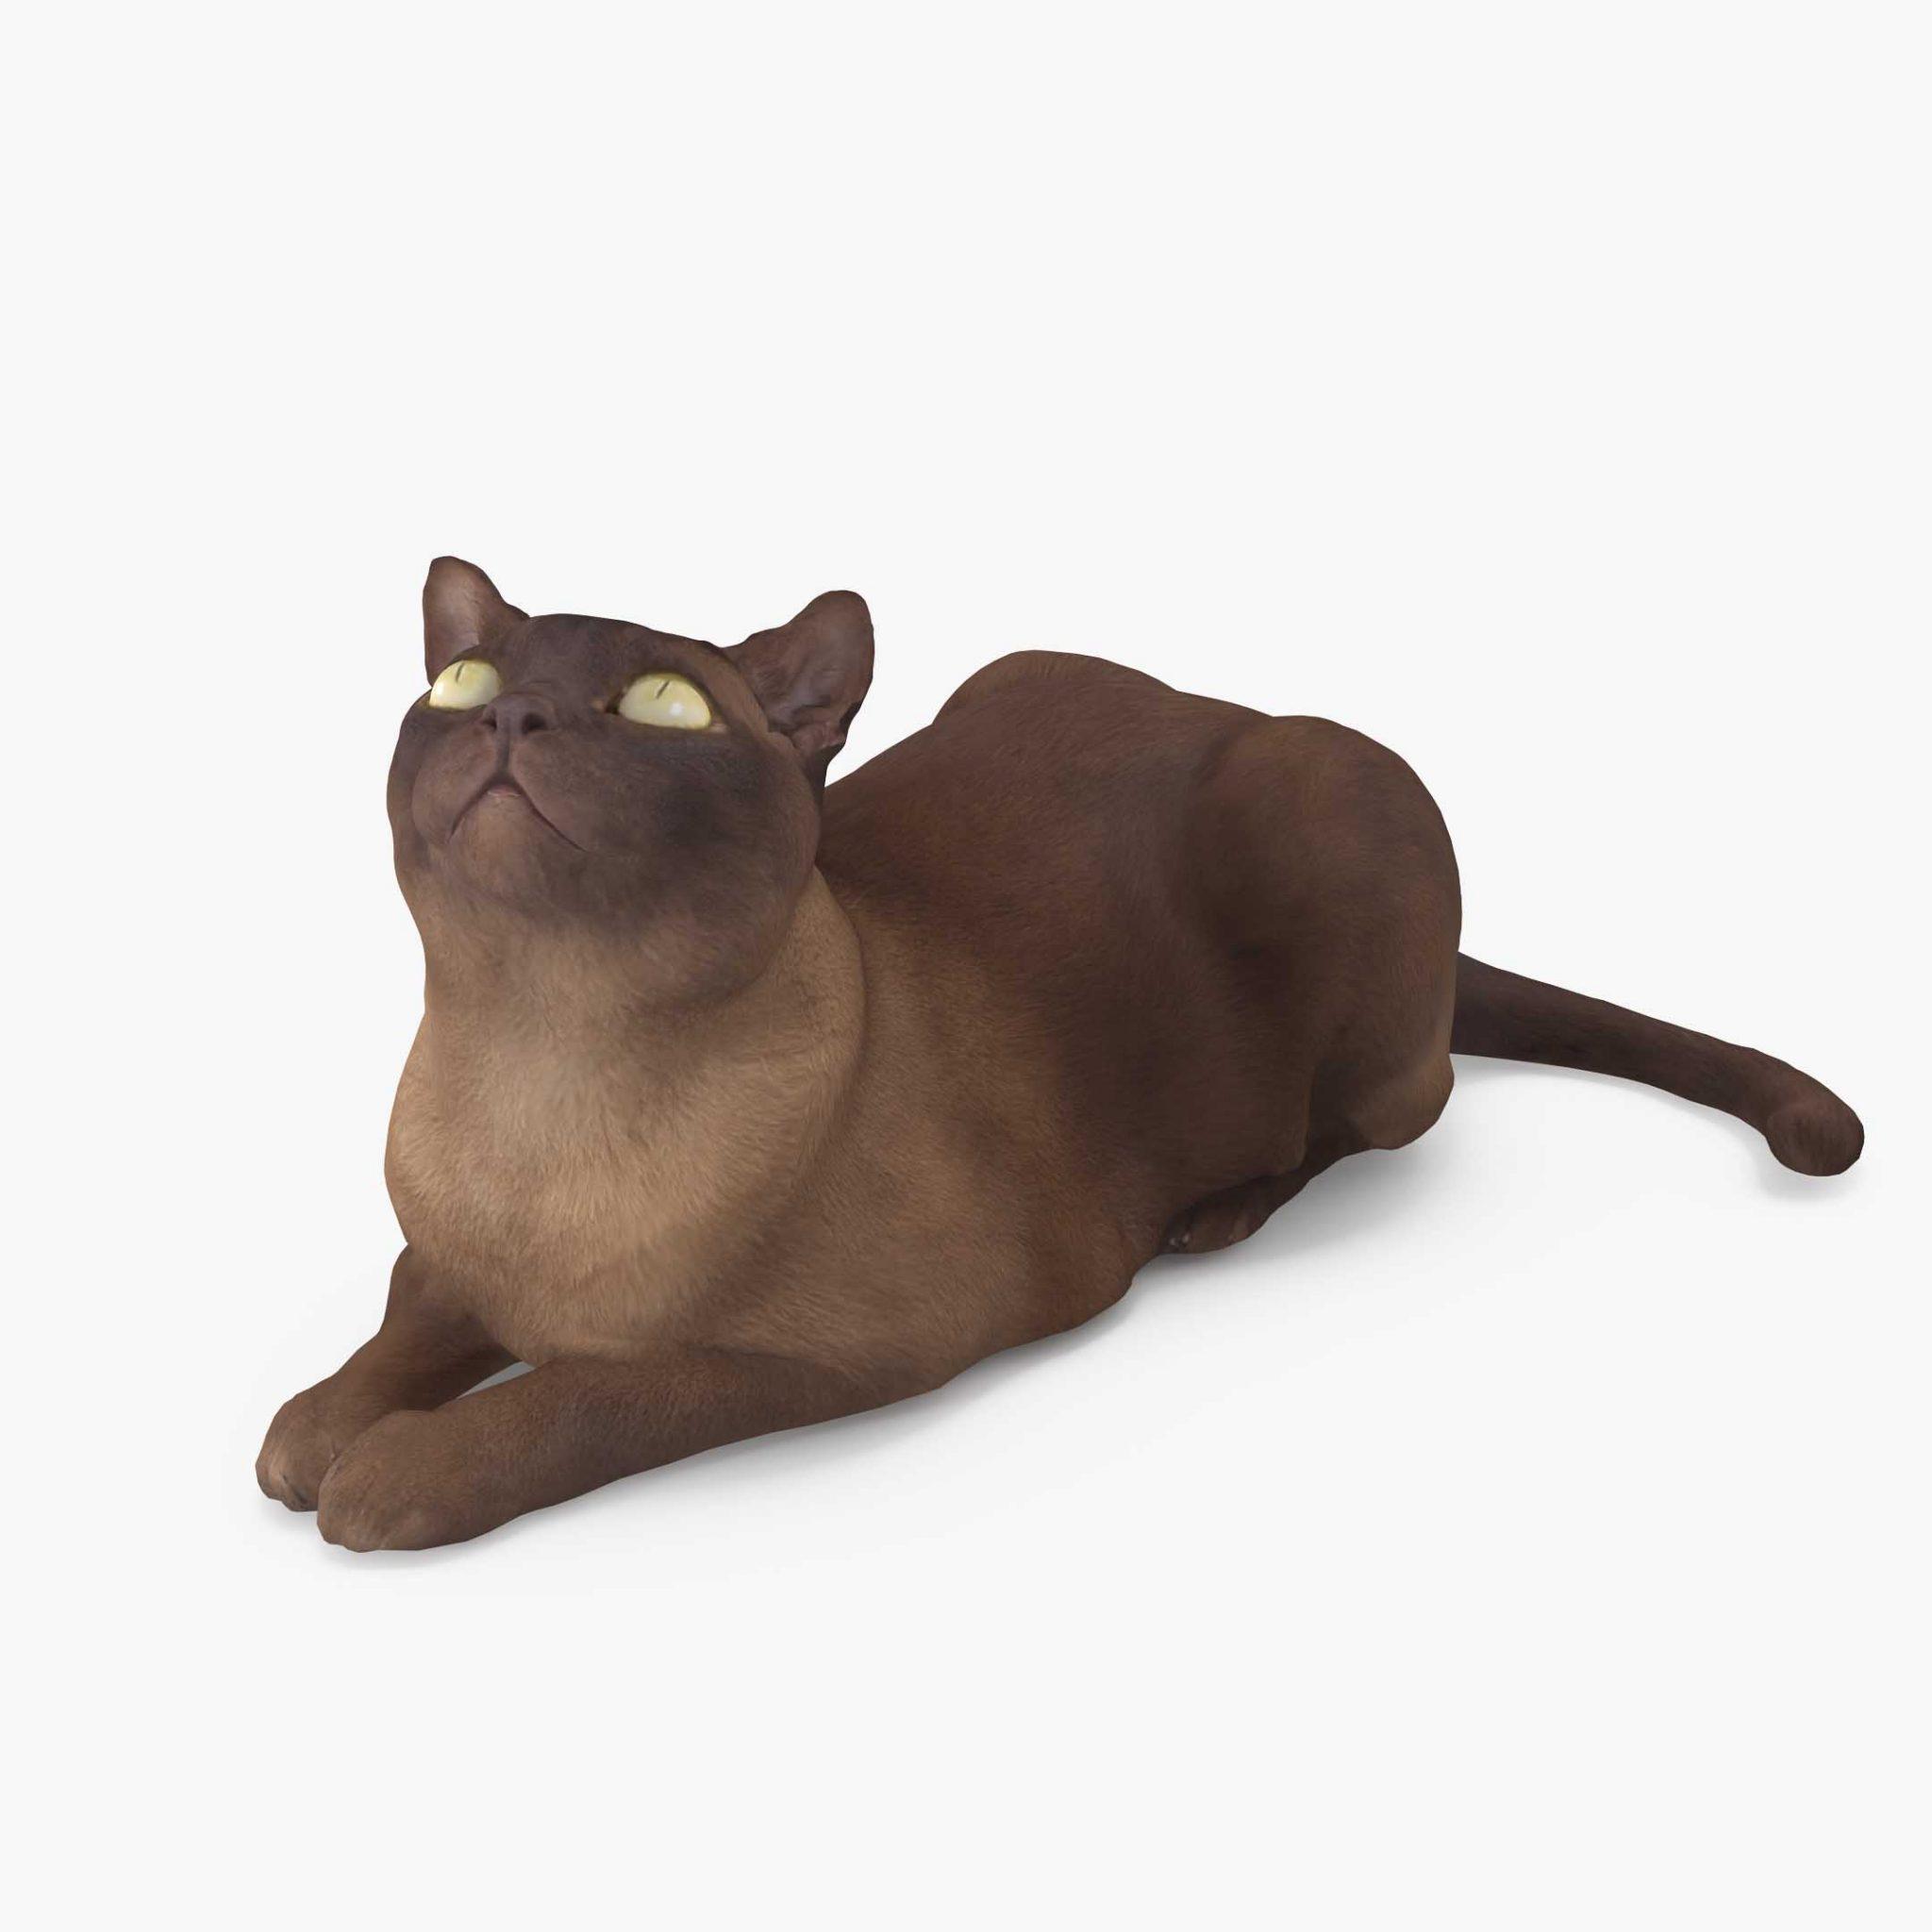 Cat Abyssinian Lying 3D Model | 3DTree Scanning Studio